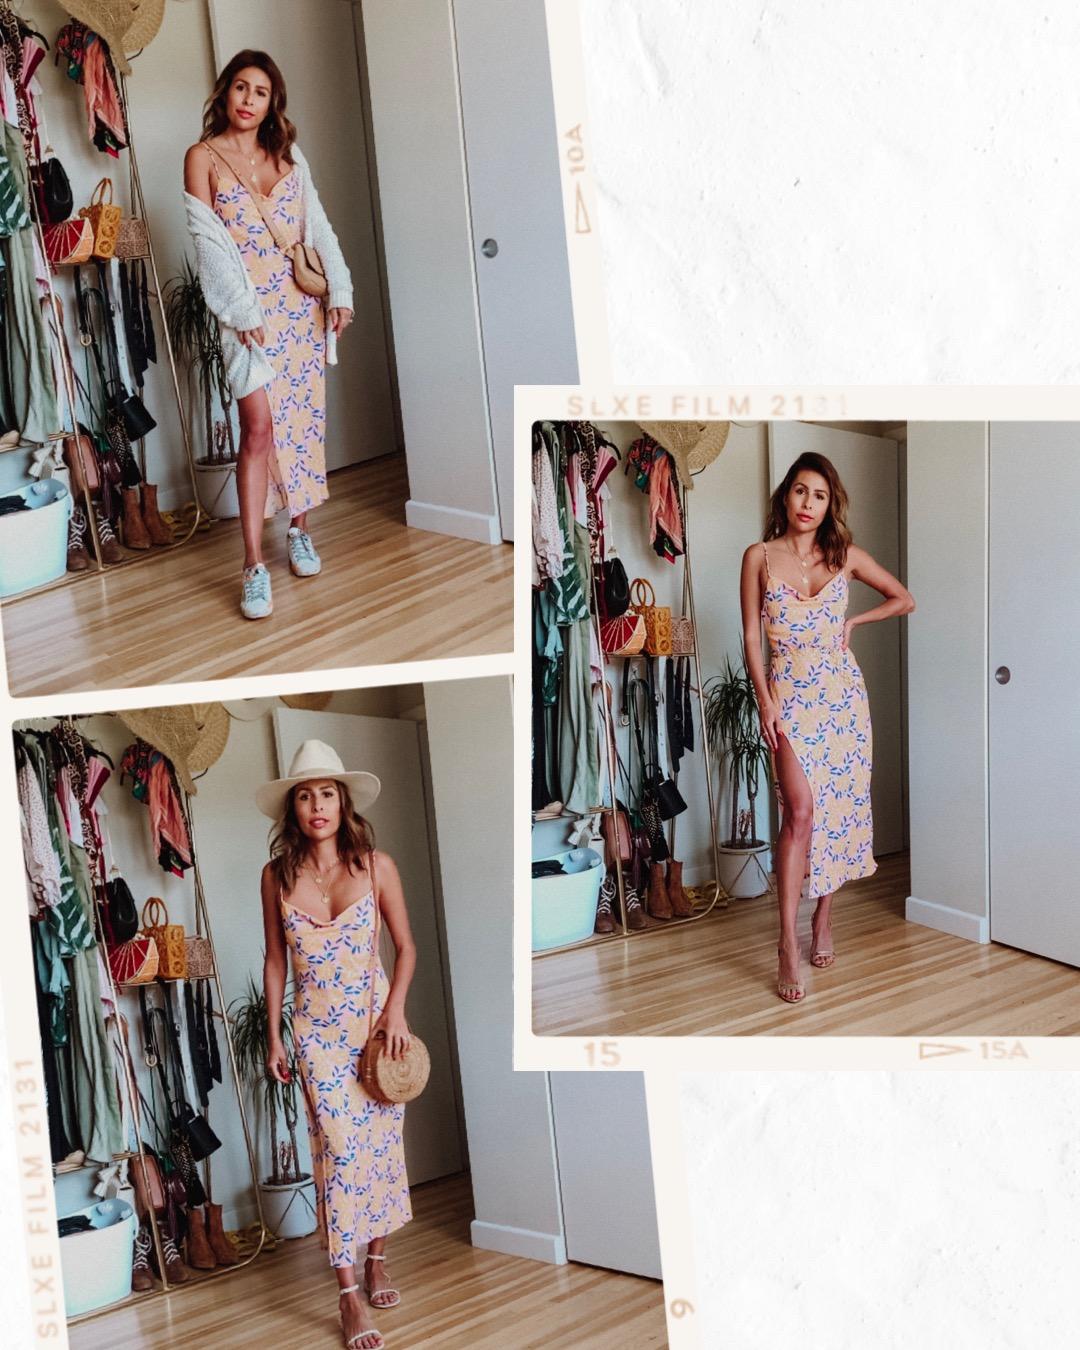 Endless Summer Madison Midi Dress - How to style it 3 ways